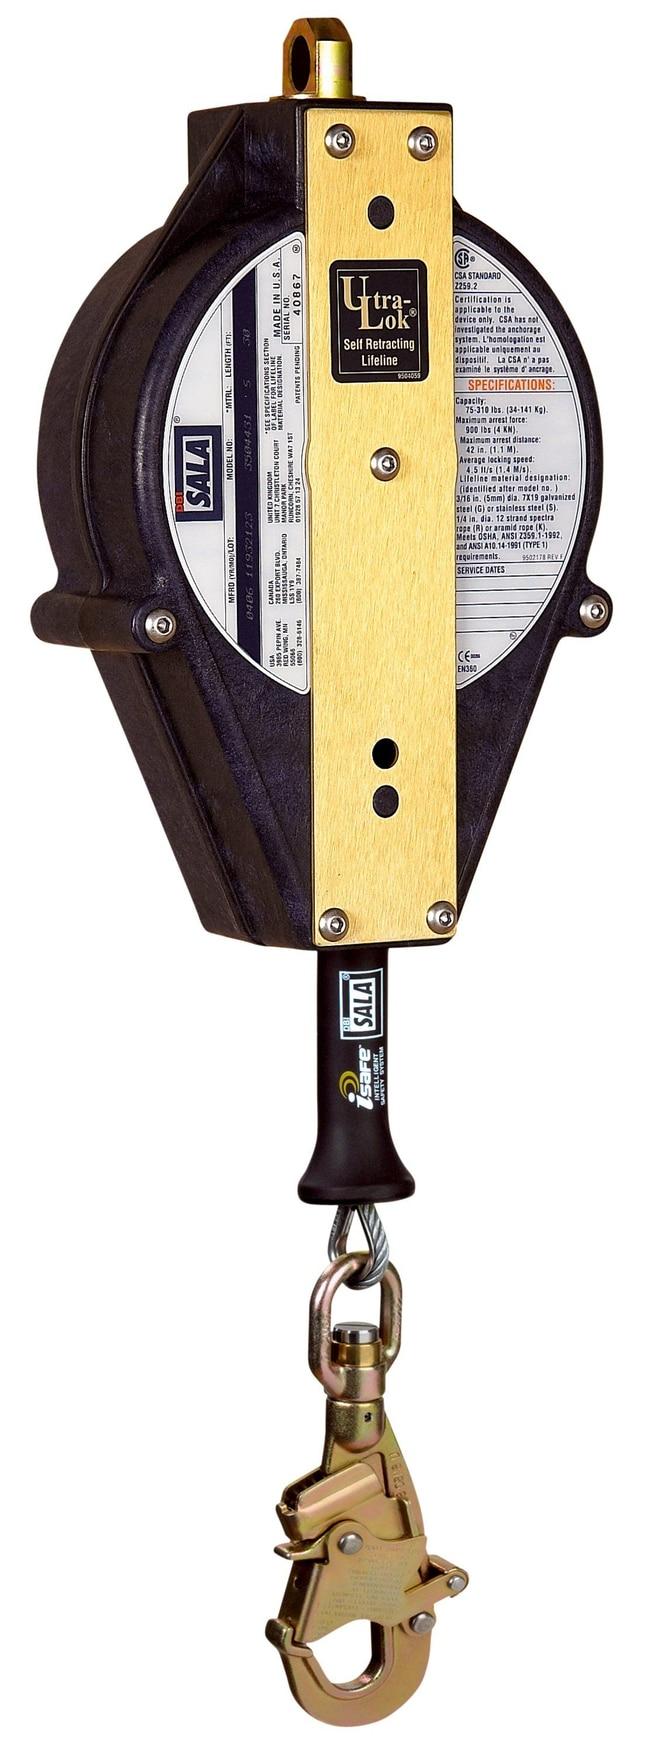 3M DBI-SALA Ultra-Lok Self Retracting Lifeline- Cable:Gloves, Glasses and